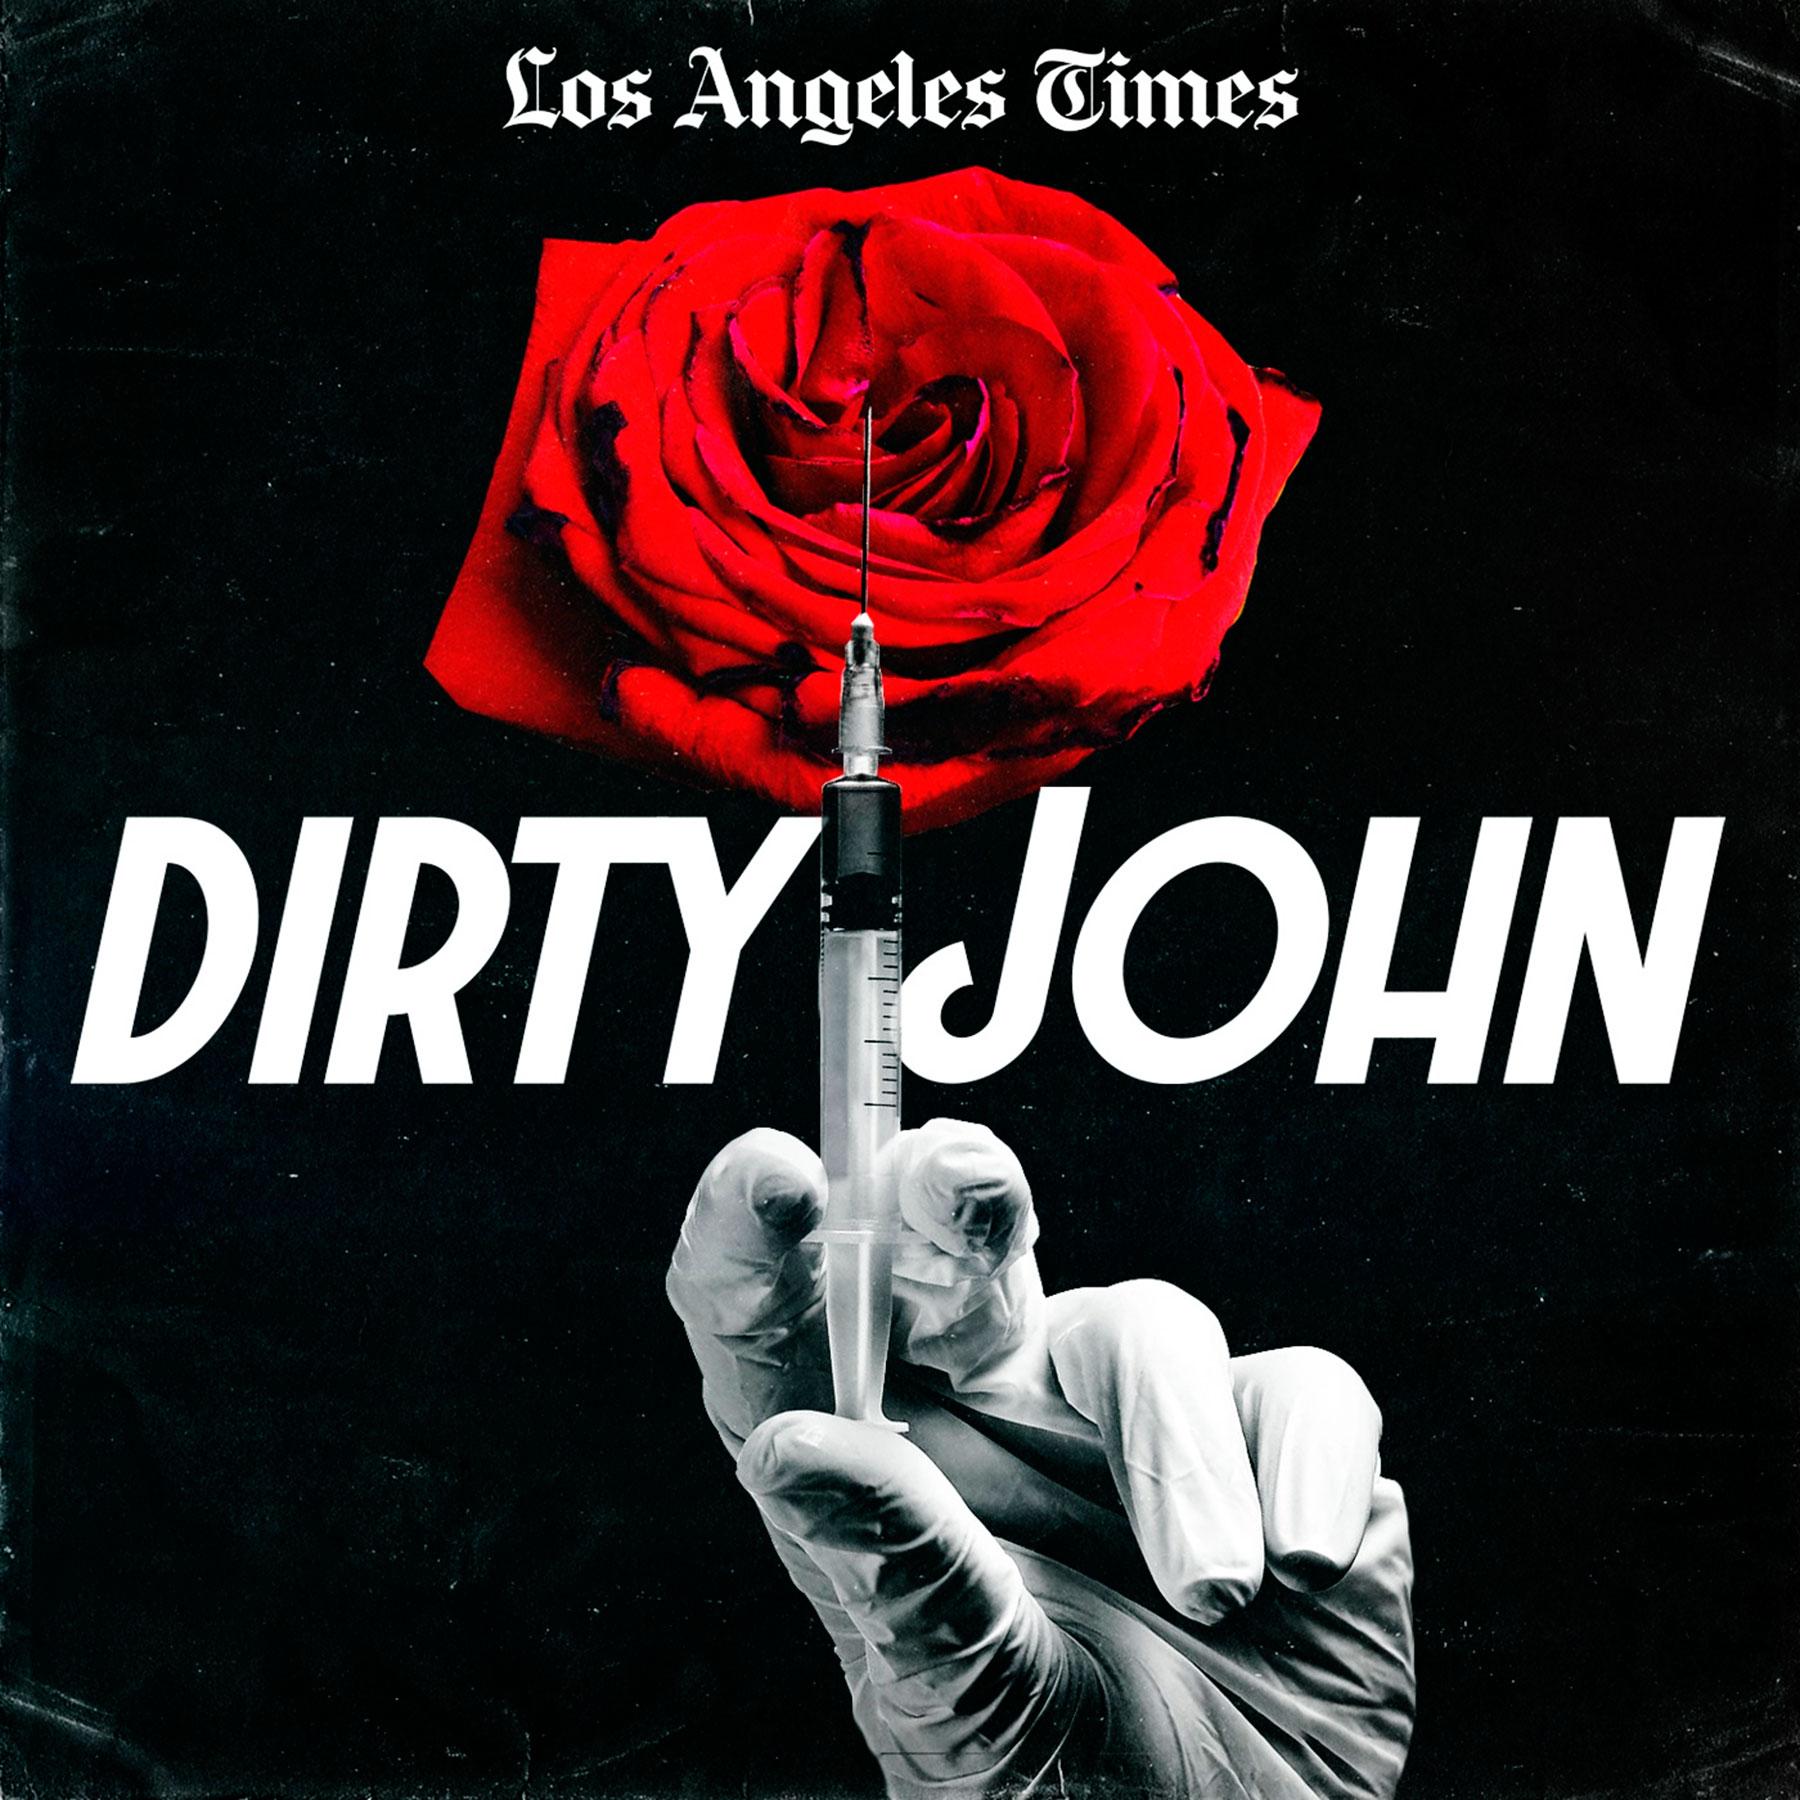 dirty john1400x1400px LAT.JPG